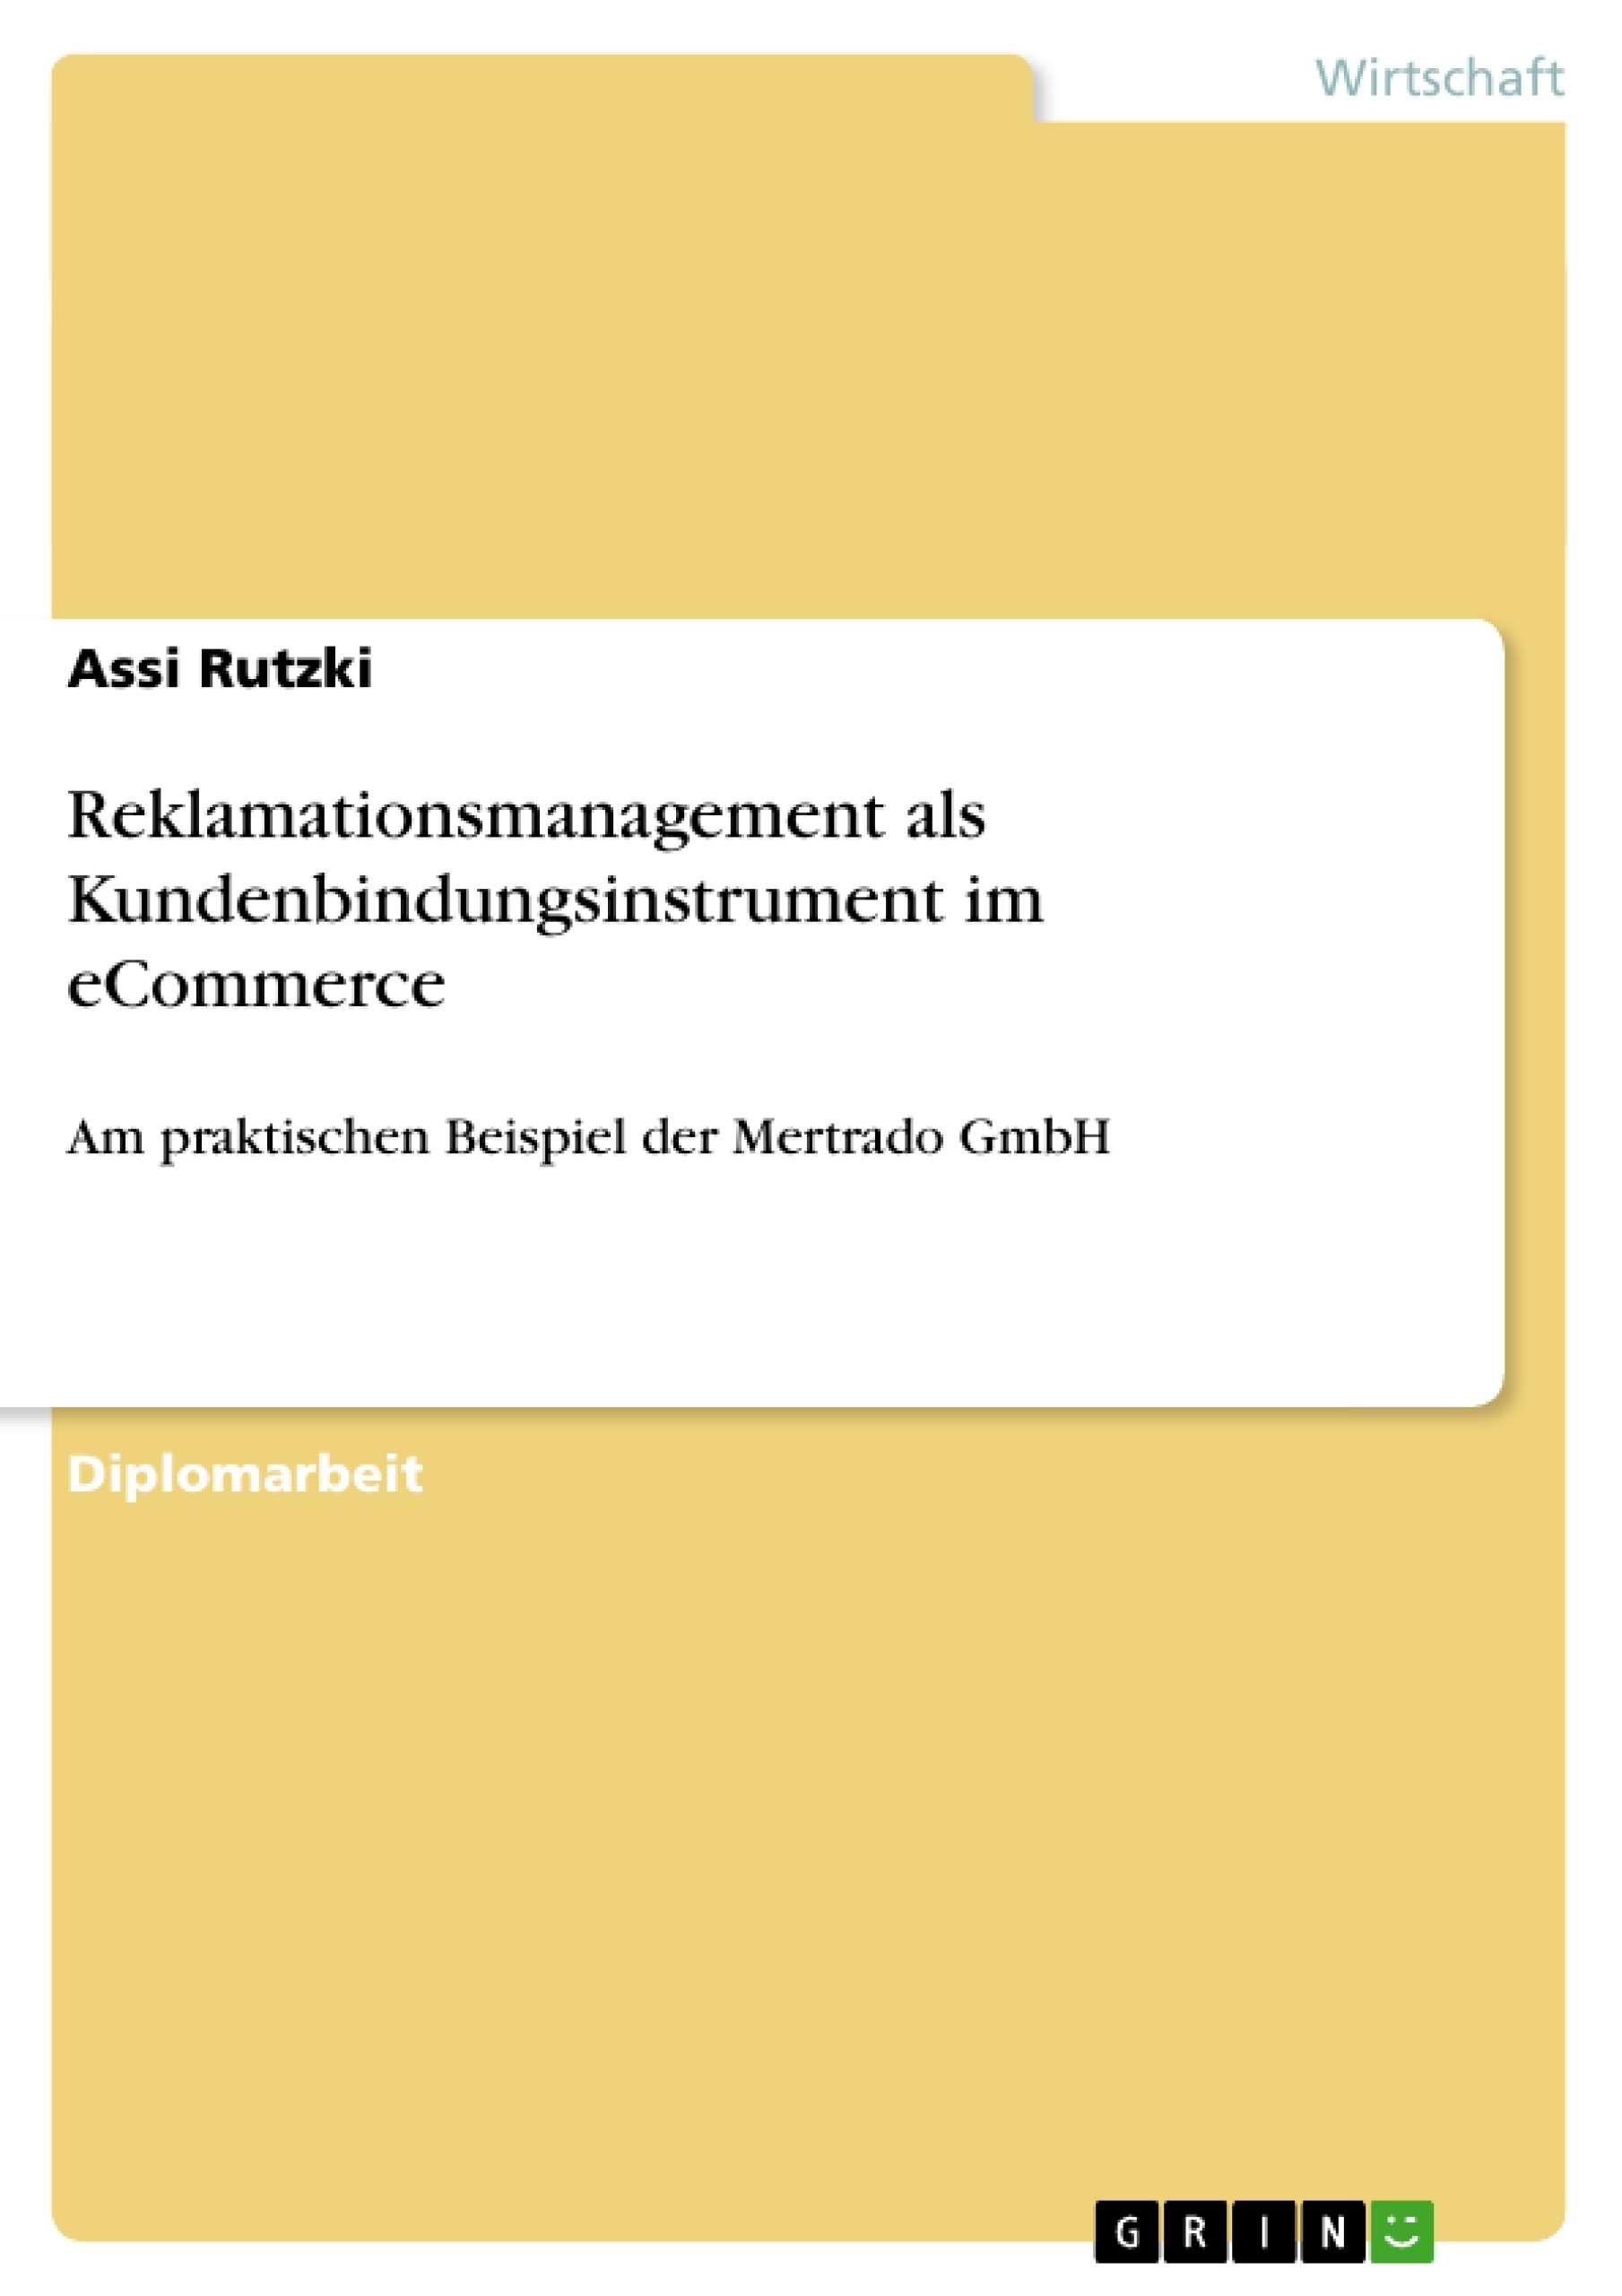 Titel: Reklamationsmanagement als Kundenbindungsinstrument im eCommerce